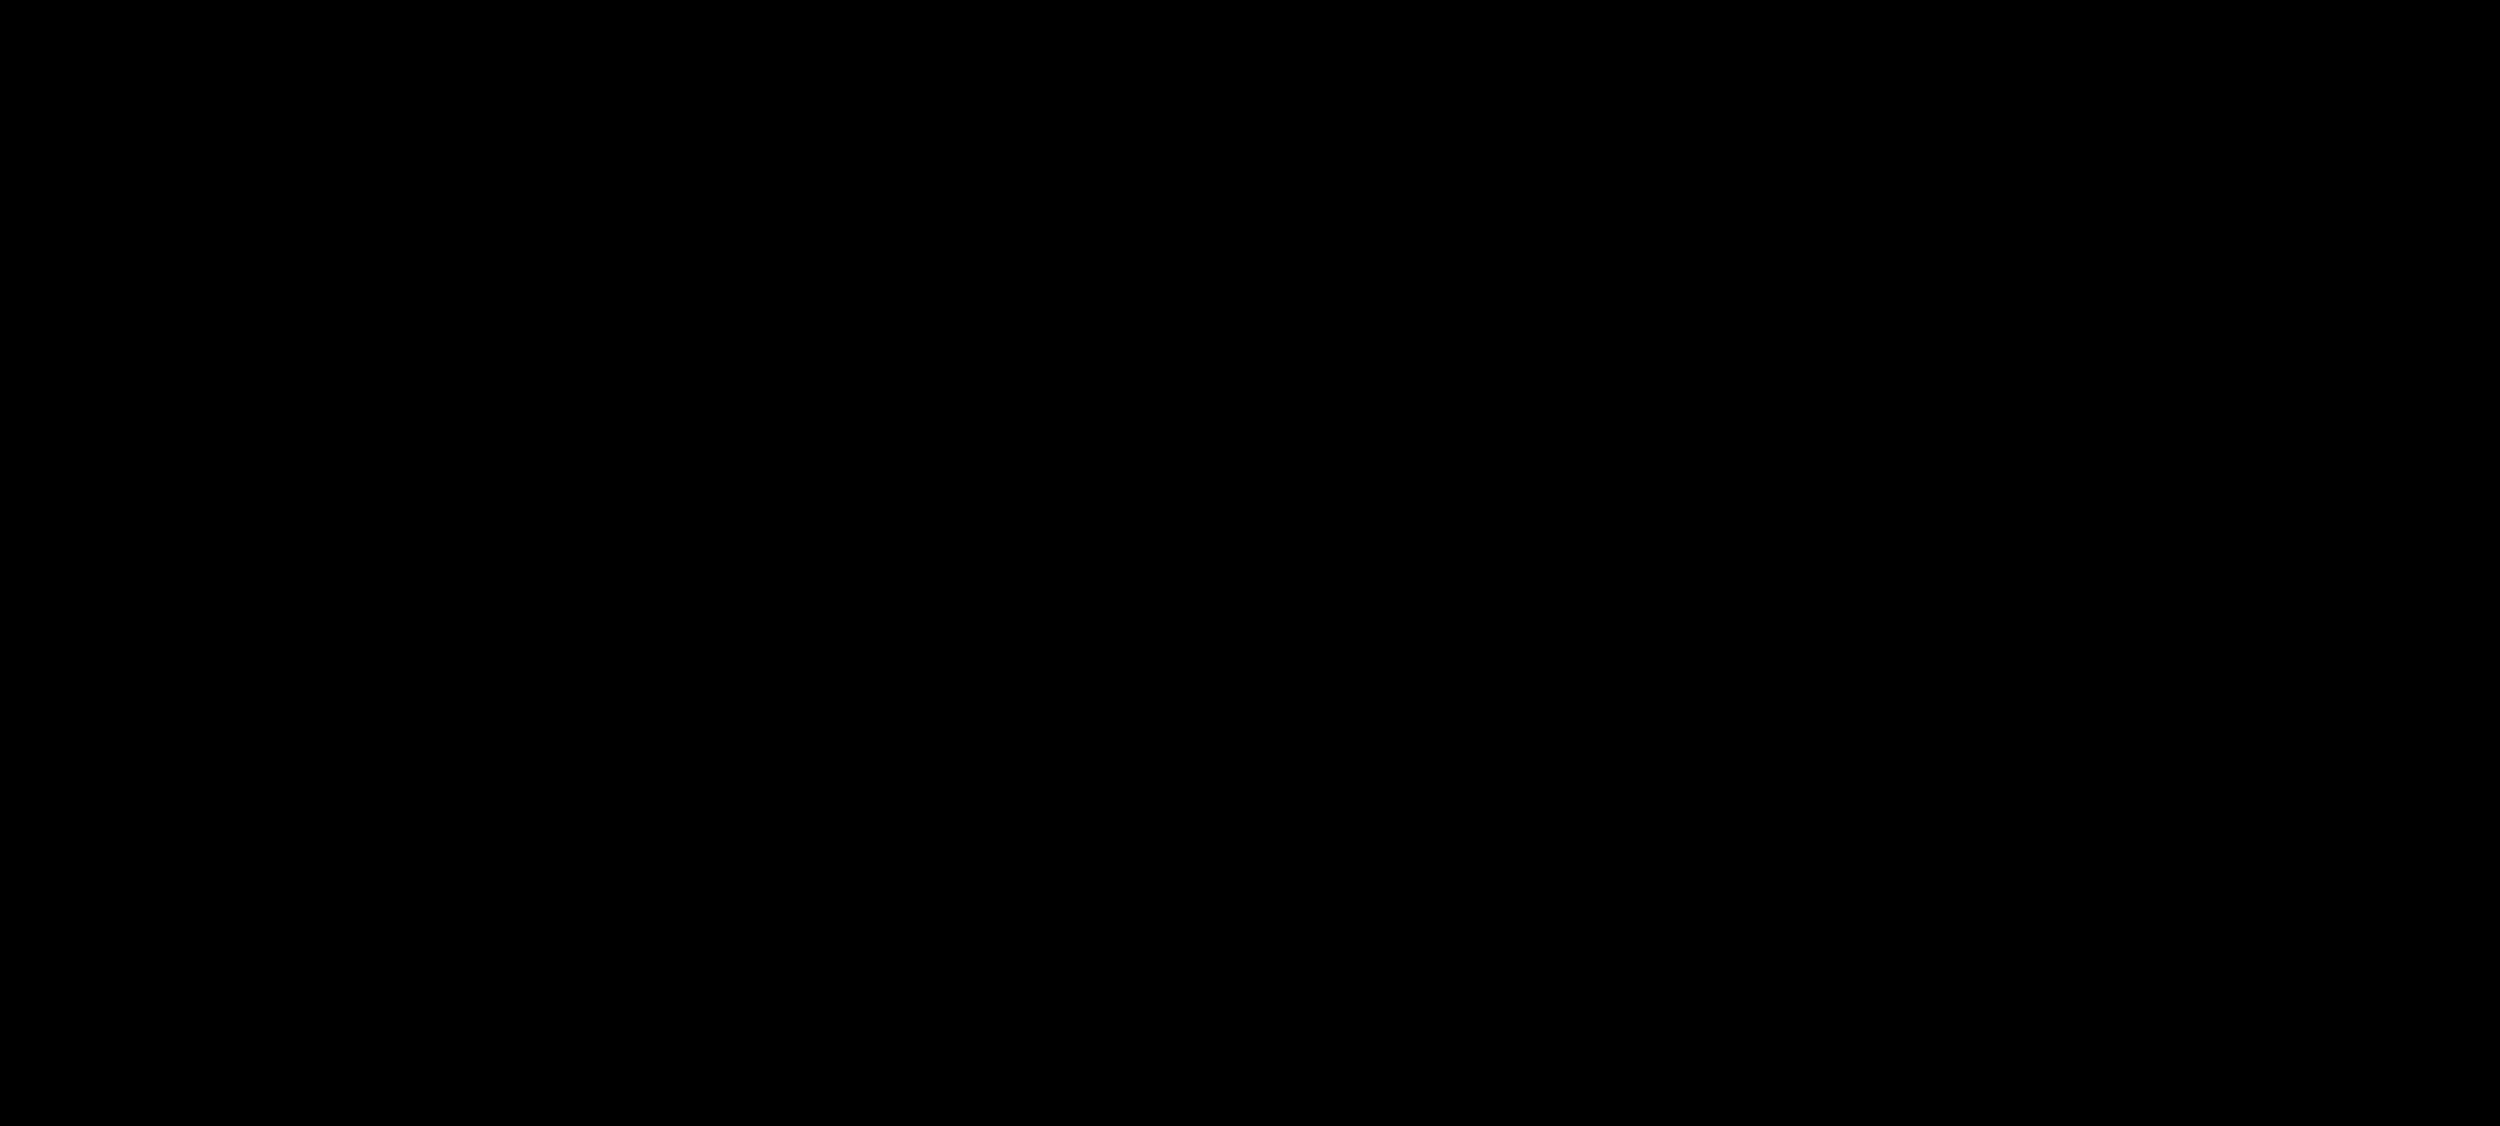 2018 ATLFF - Georgia Film (black).png